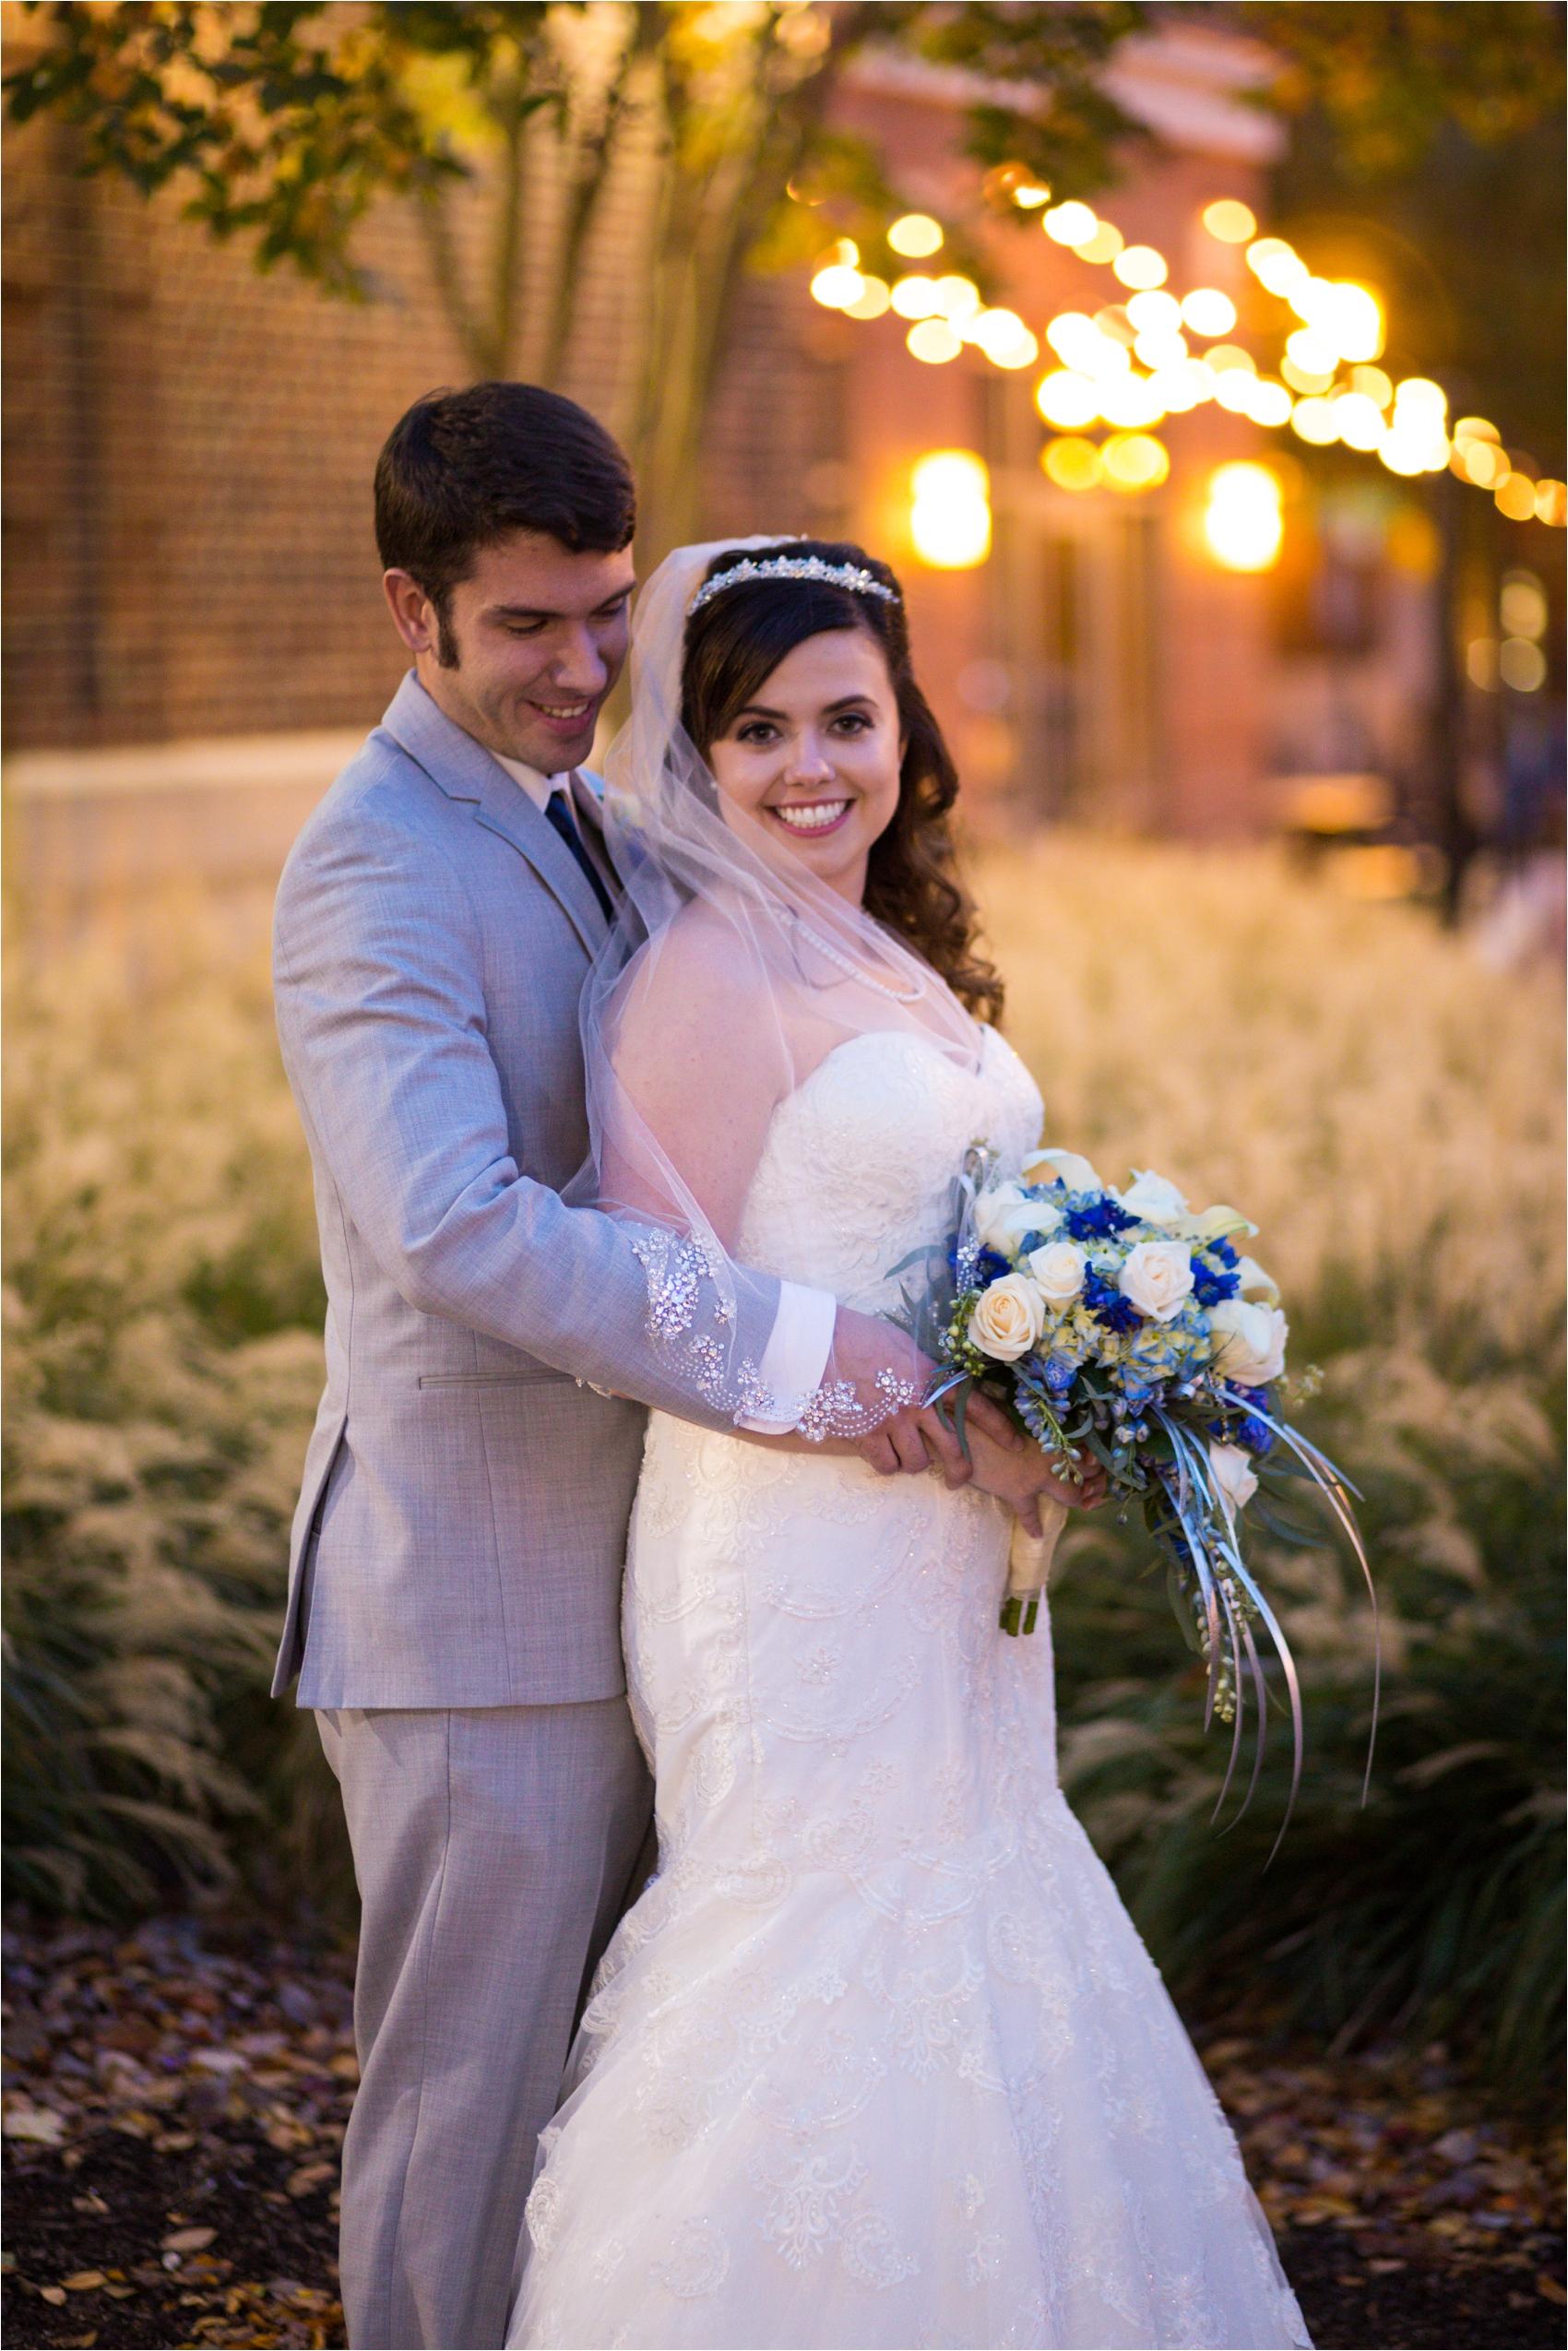 Newport-News-Winter-Wonderland-Wedding_0194.jpg